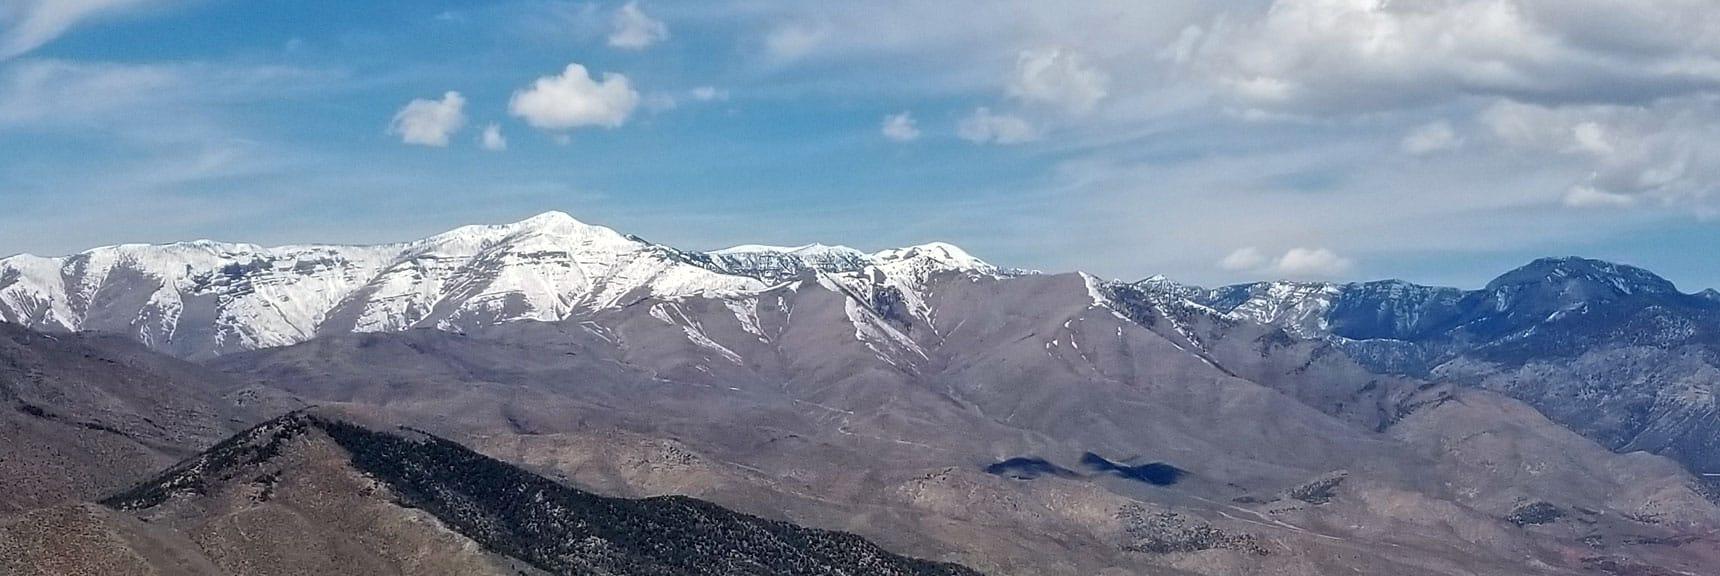 Mt Charleston Wilderness from 7800ft on Keystone Thrust, La Madre Mt Wilderness, NV